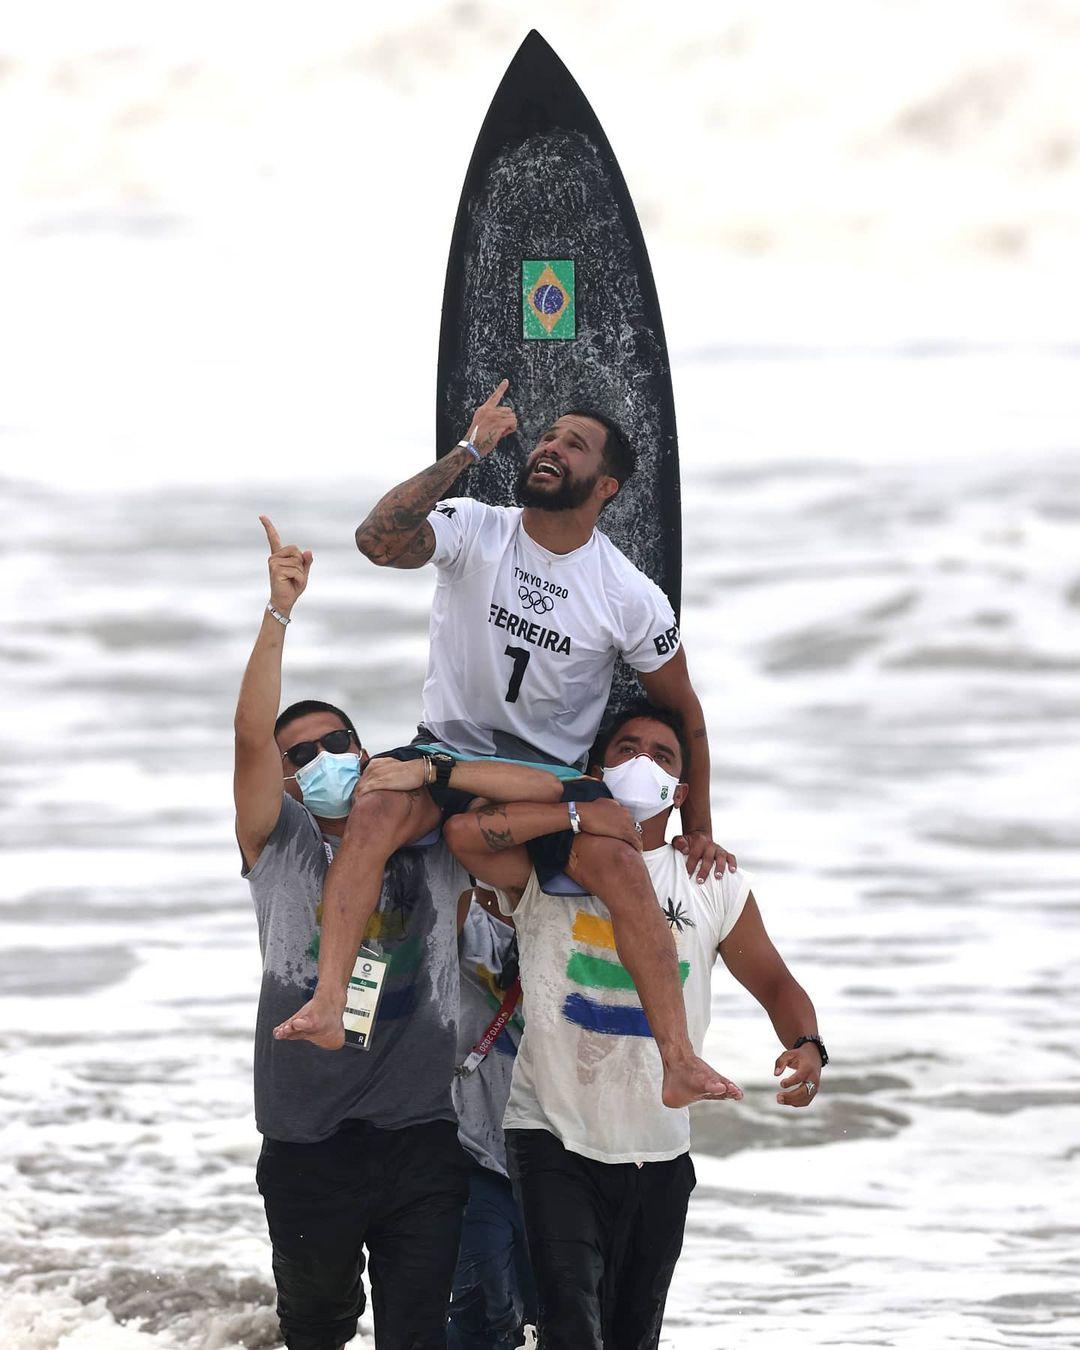 italo ferreira champion olympique tokyo 2020 surf médaille d'or